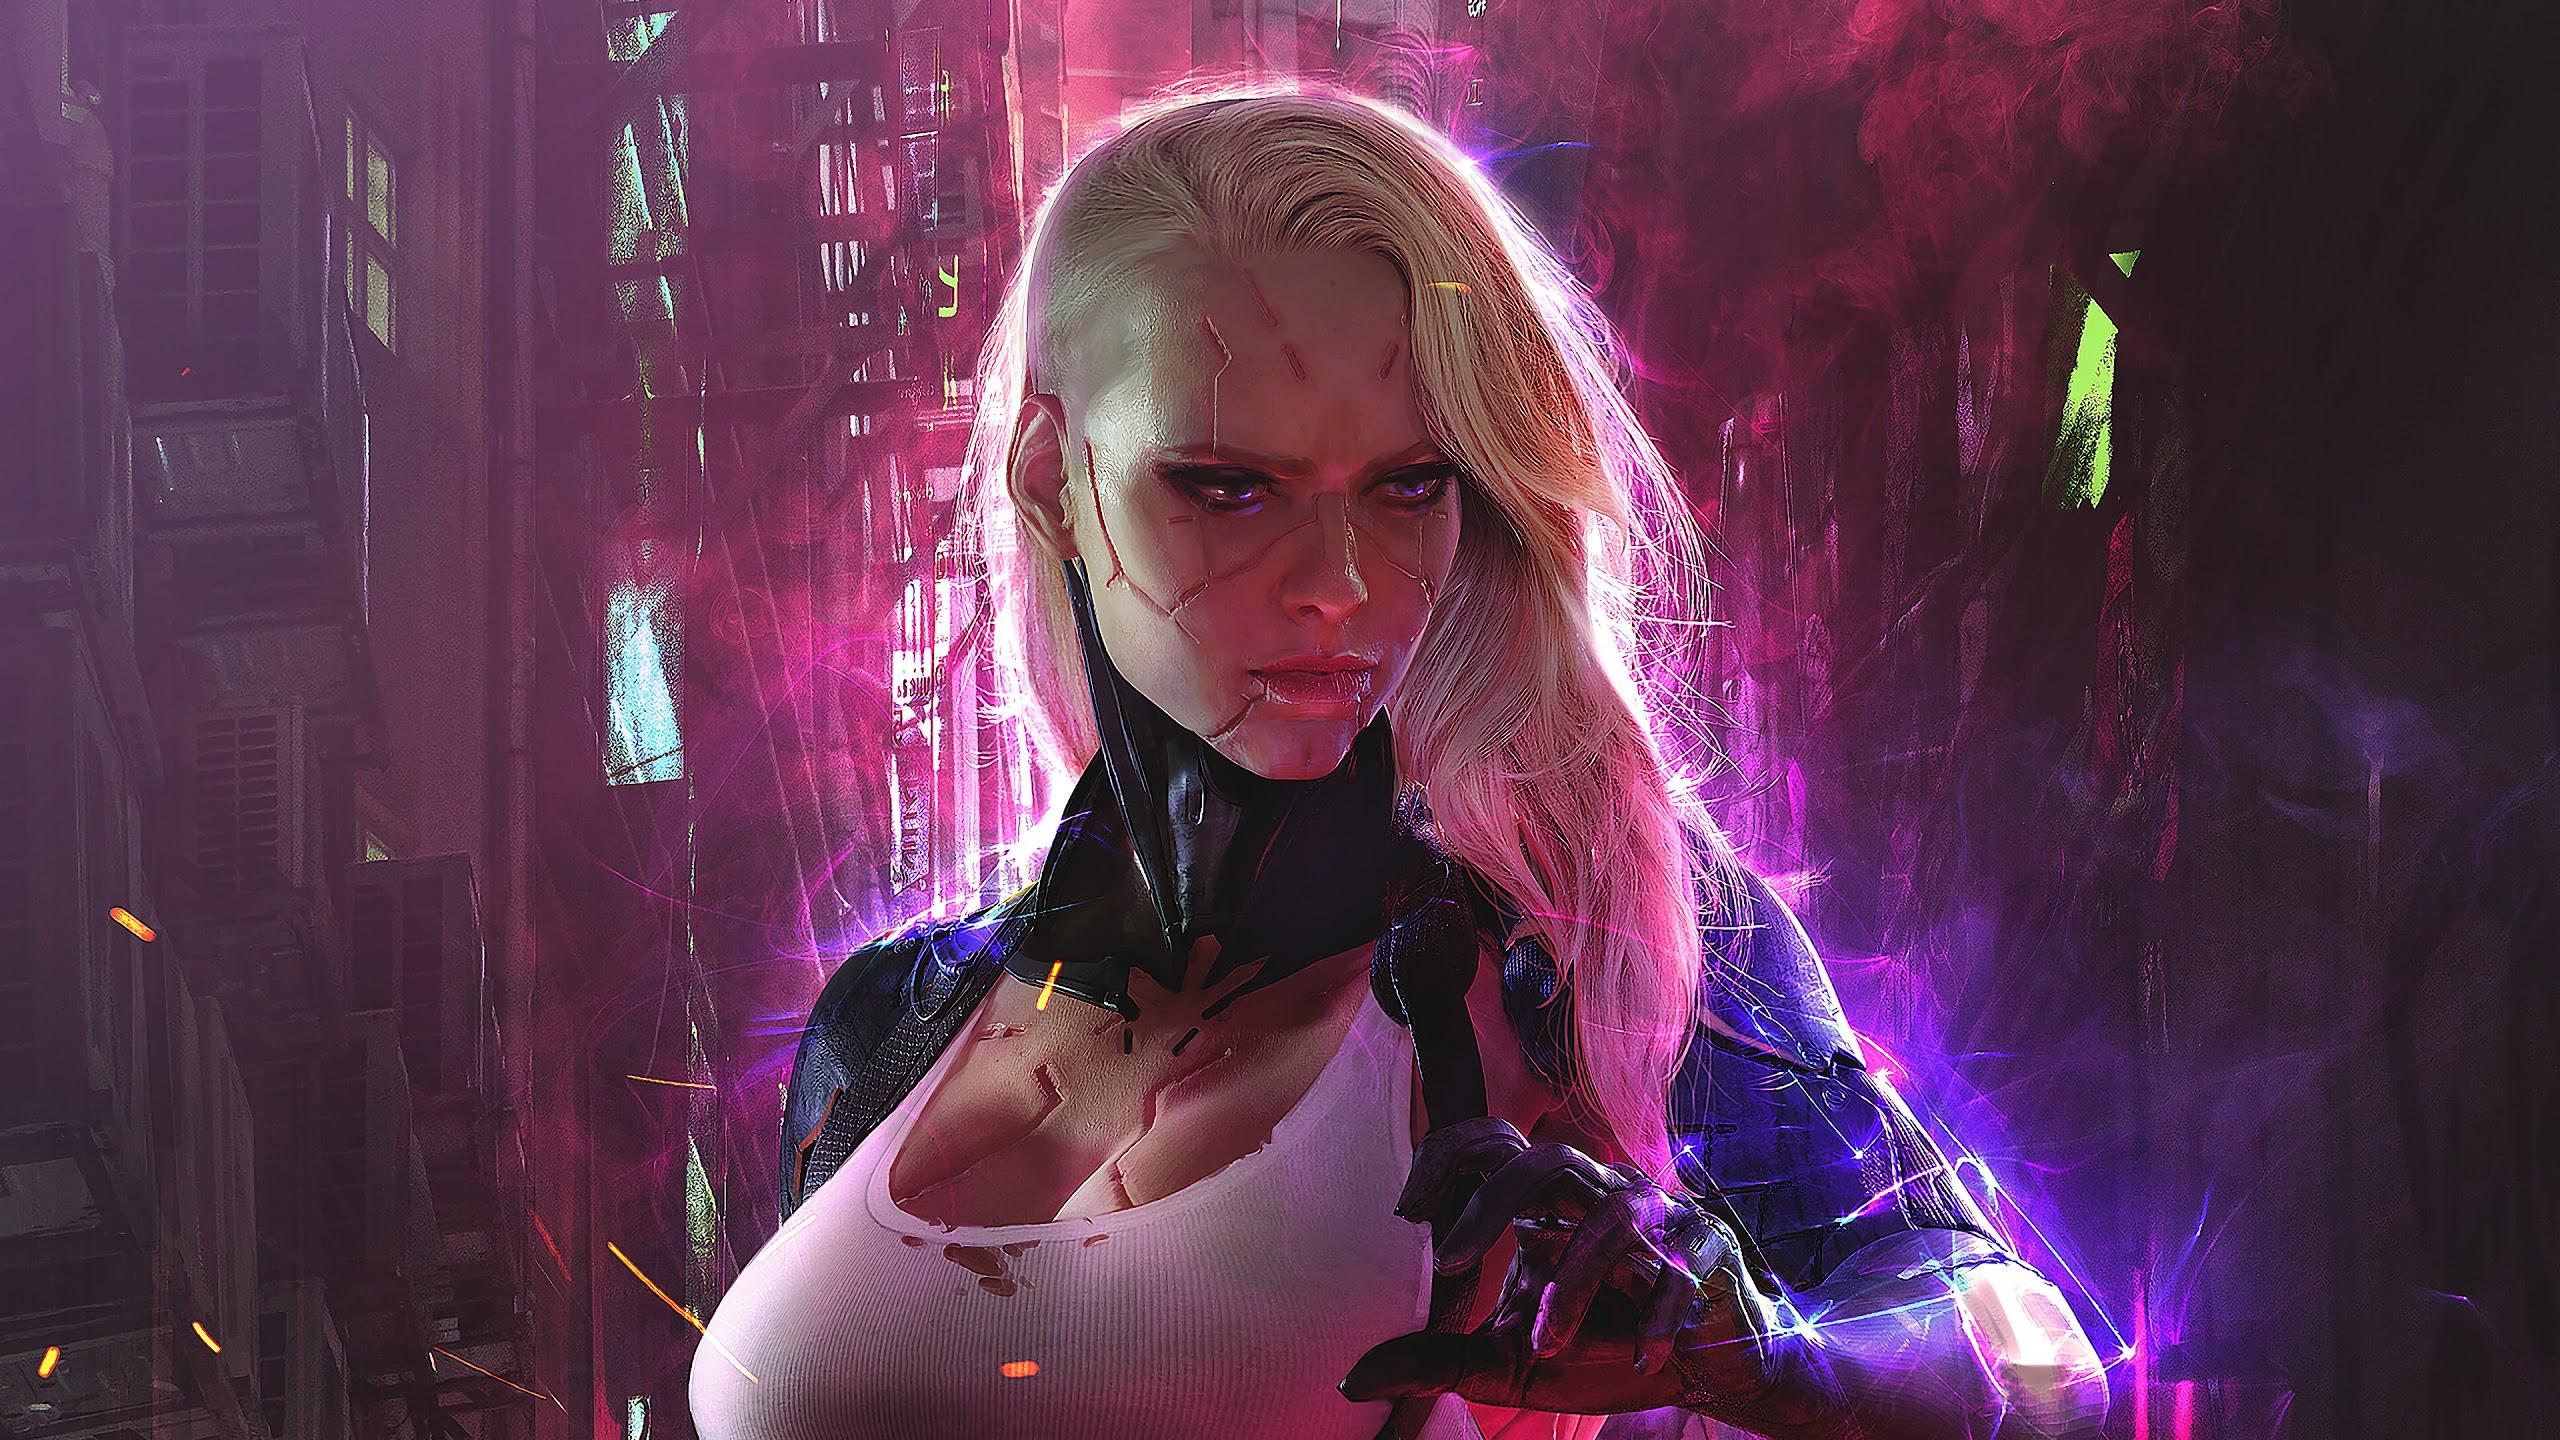 Cyberpunk Girl Sci Fi 4k Cyberpunk 2077 2560x1440 Download Hd Wallpaper Wallpapertip